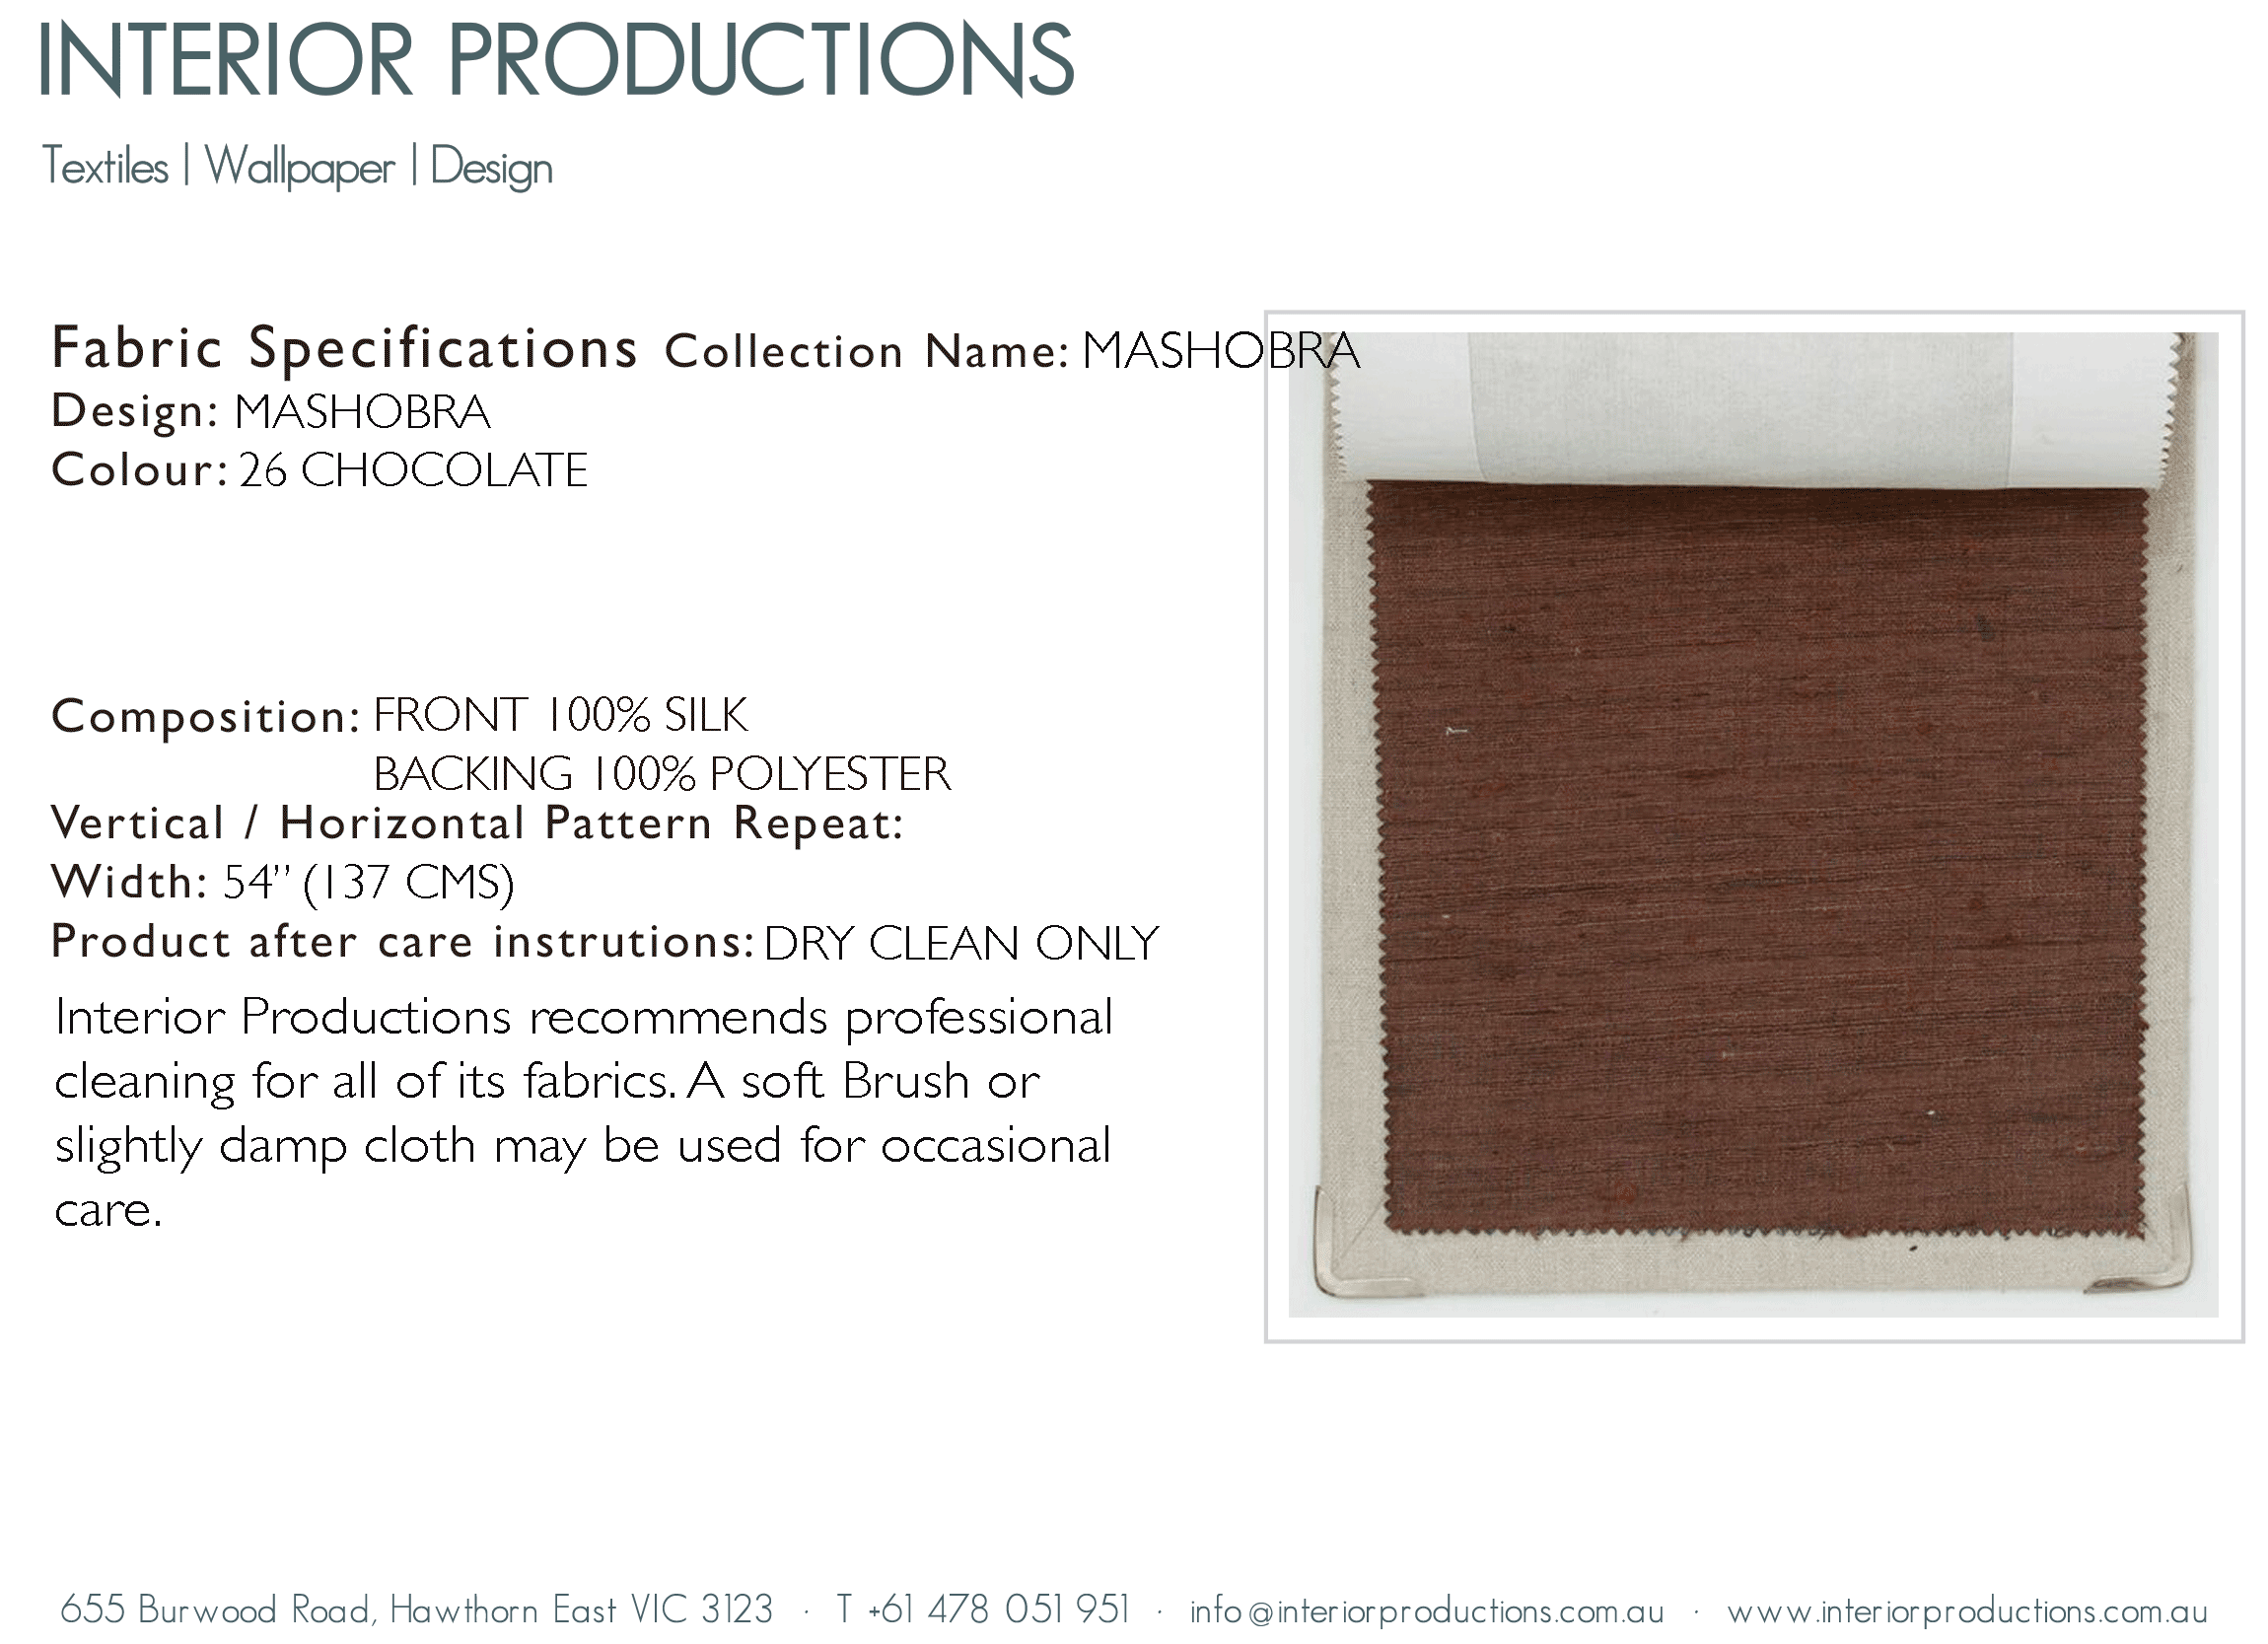 interior_productions_MASHOBRA---26-CHOCOLATE